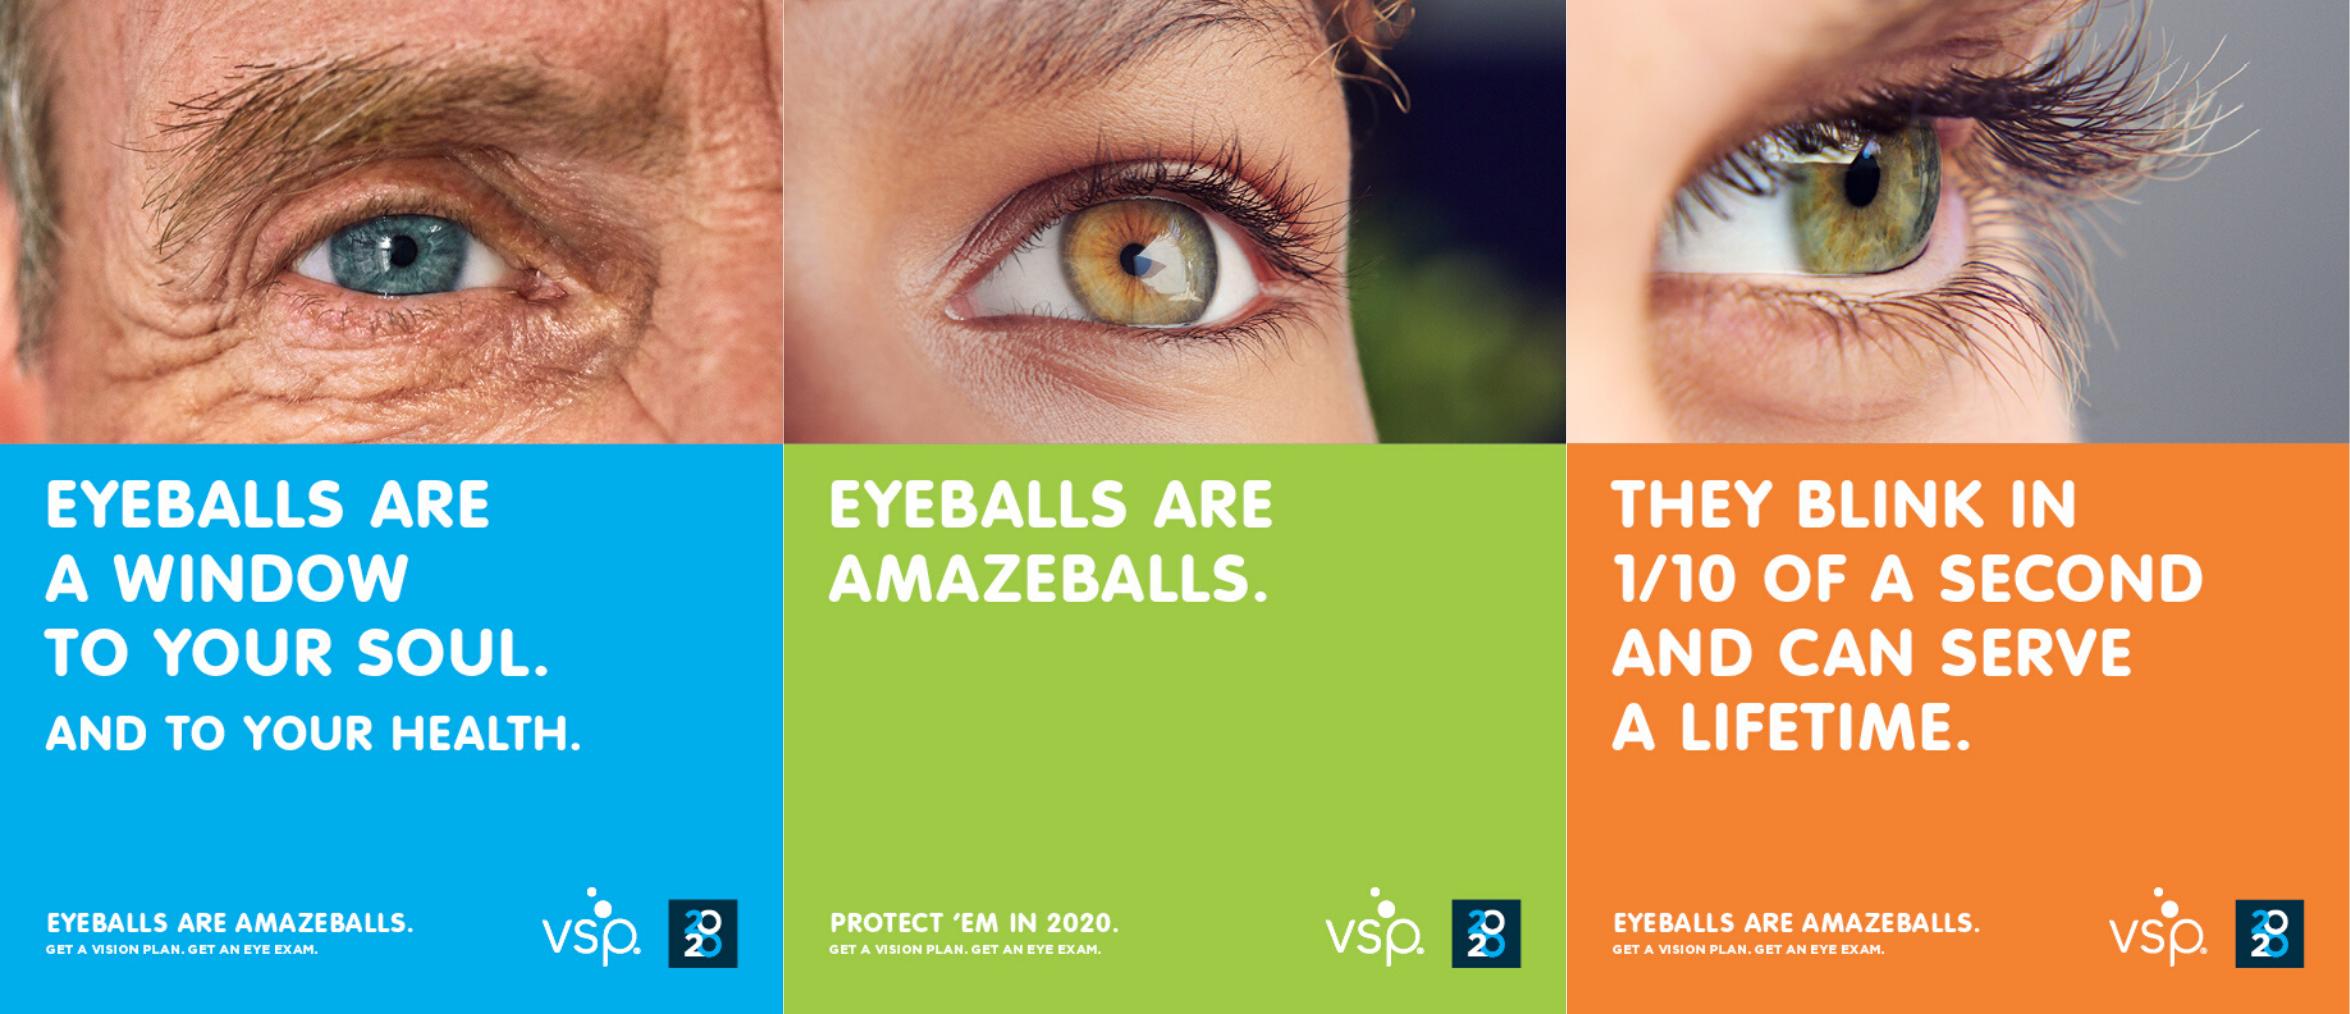 Eyeballs are Amazeballs